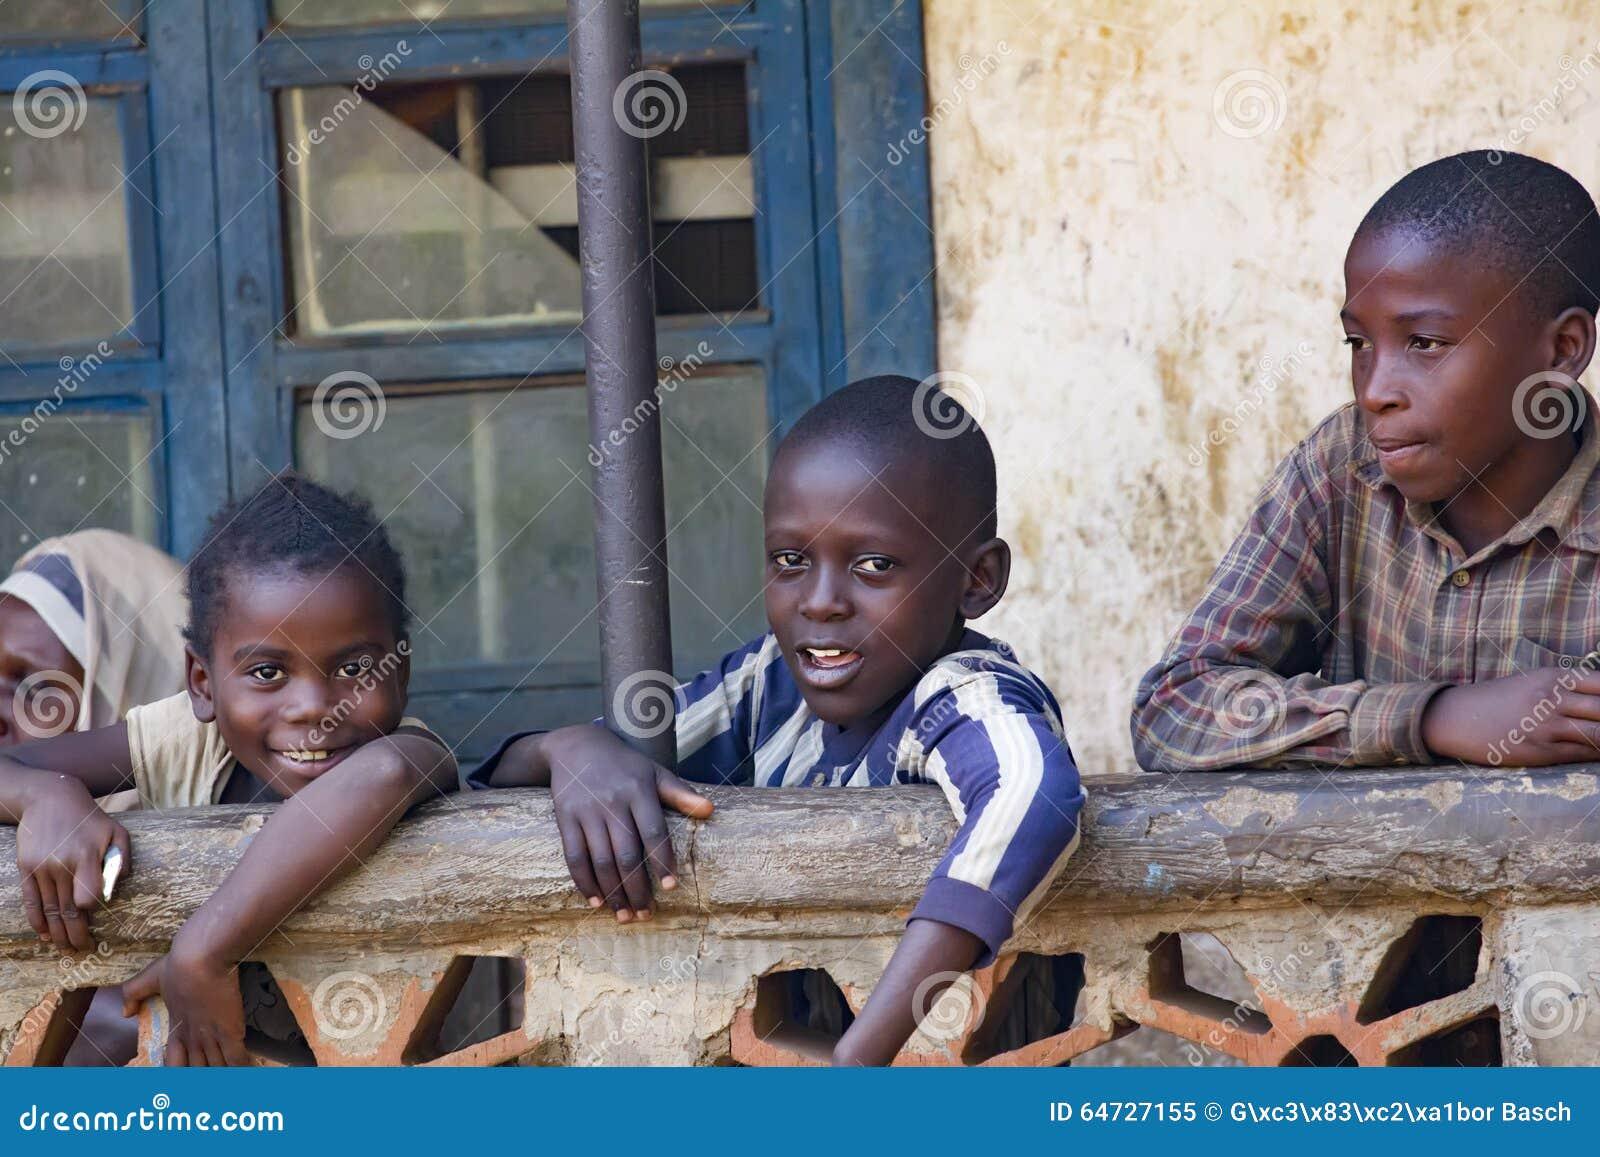 Afrikaanse kinderen van Oeganda